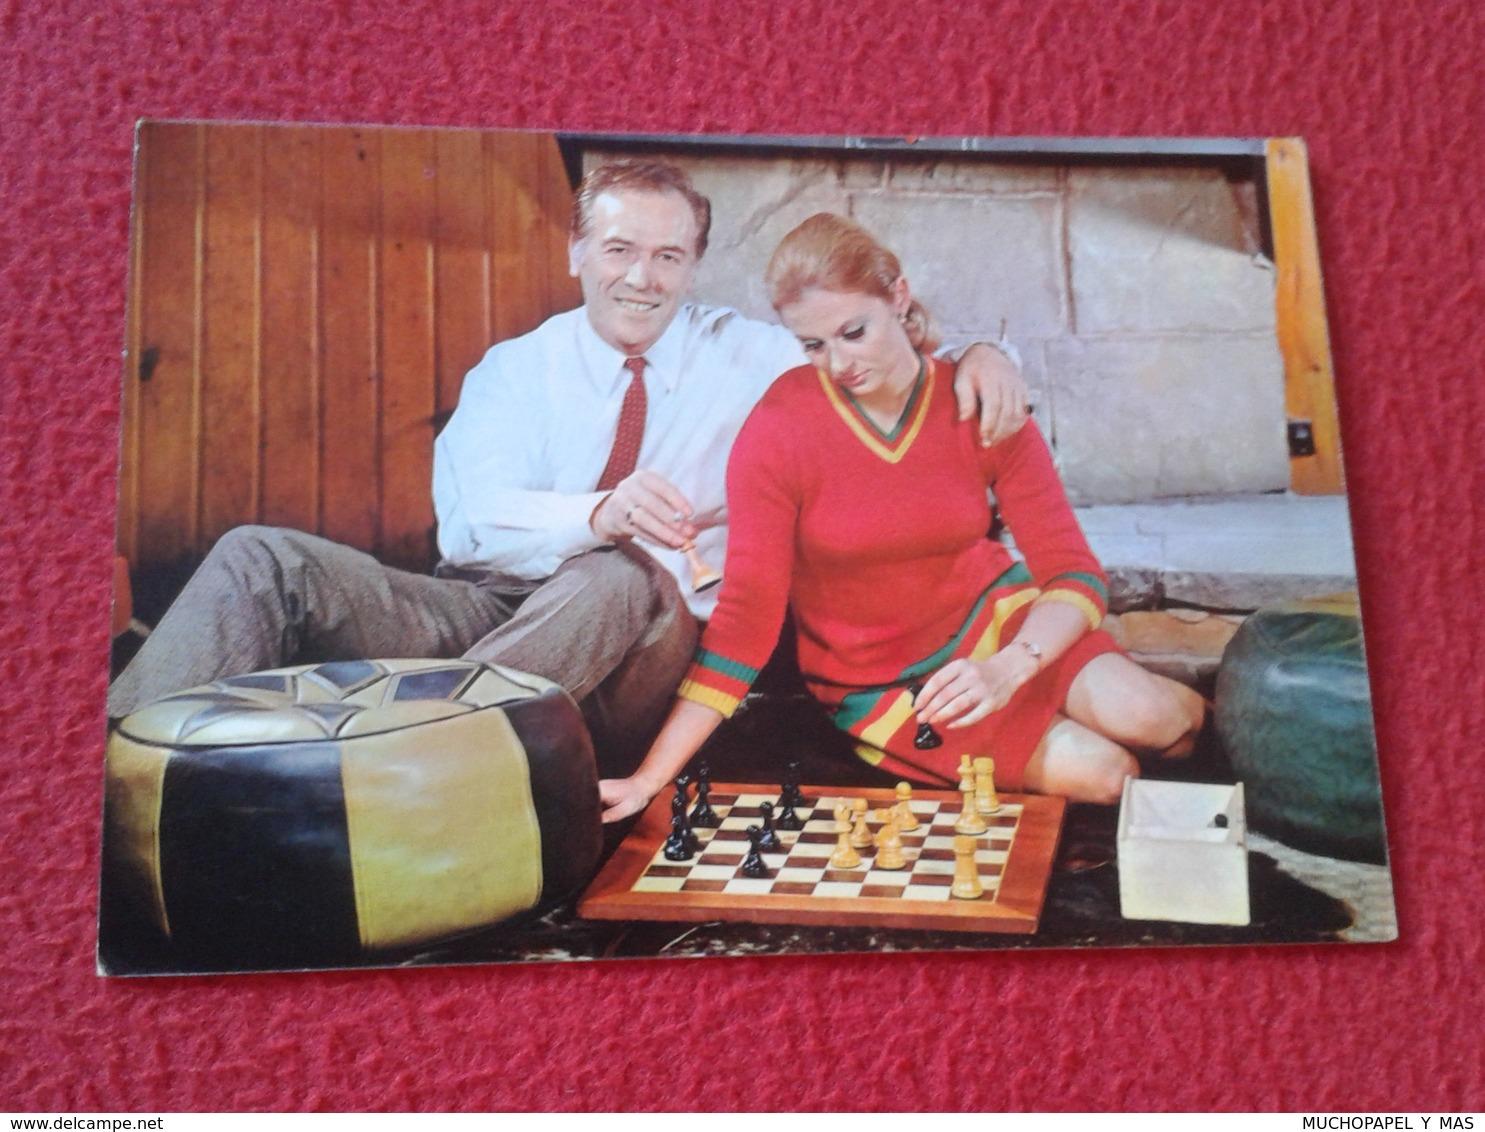 POSTAL POST CARD AJEDREZ CHESS Échecs SCHACH XADREZ GAME PARTIDA PLAYING MAN WOMAN PAREJA MATRIMONIO COUPLE VER FOTOS - Postcards